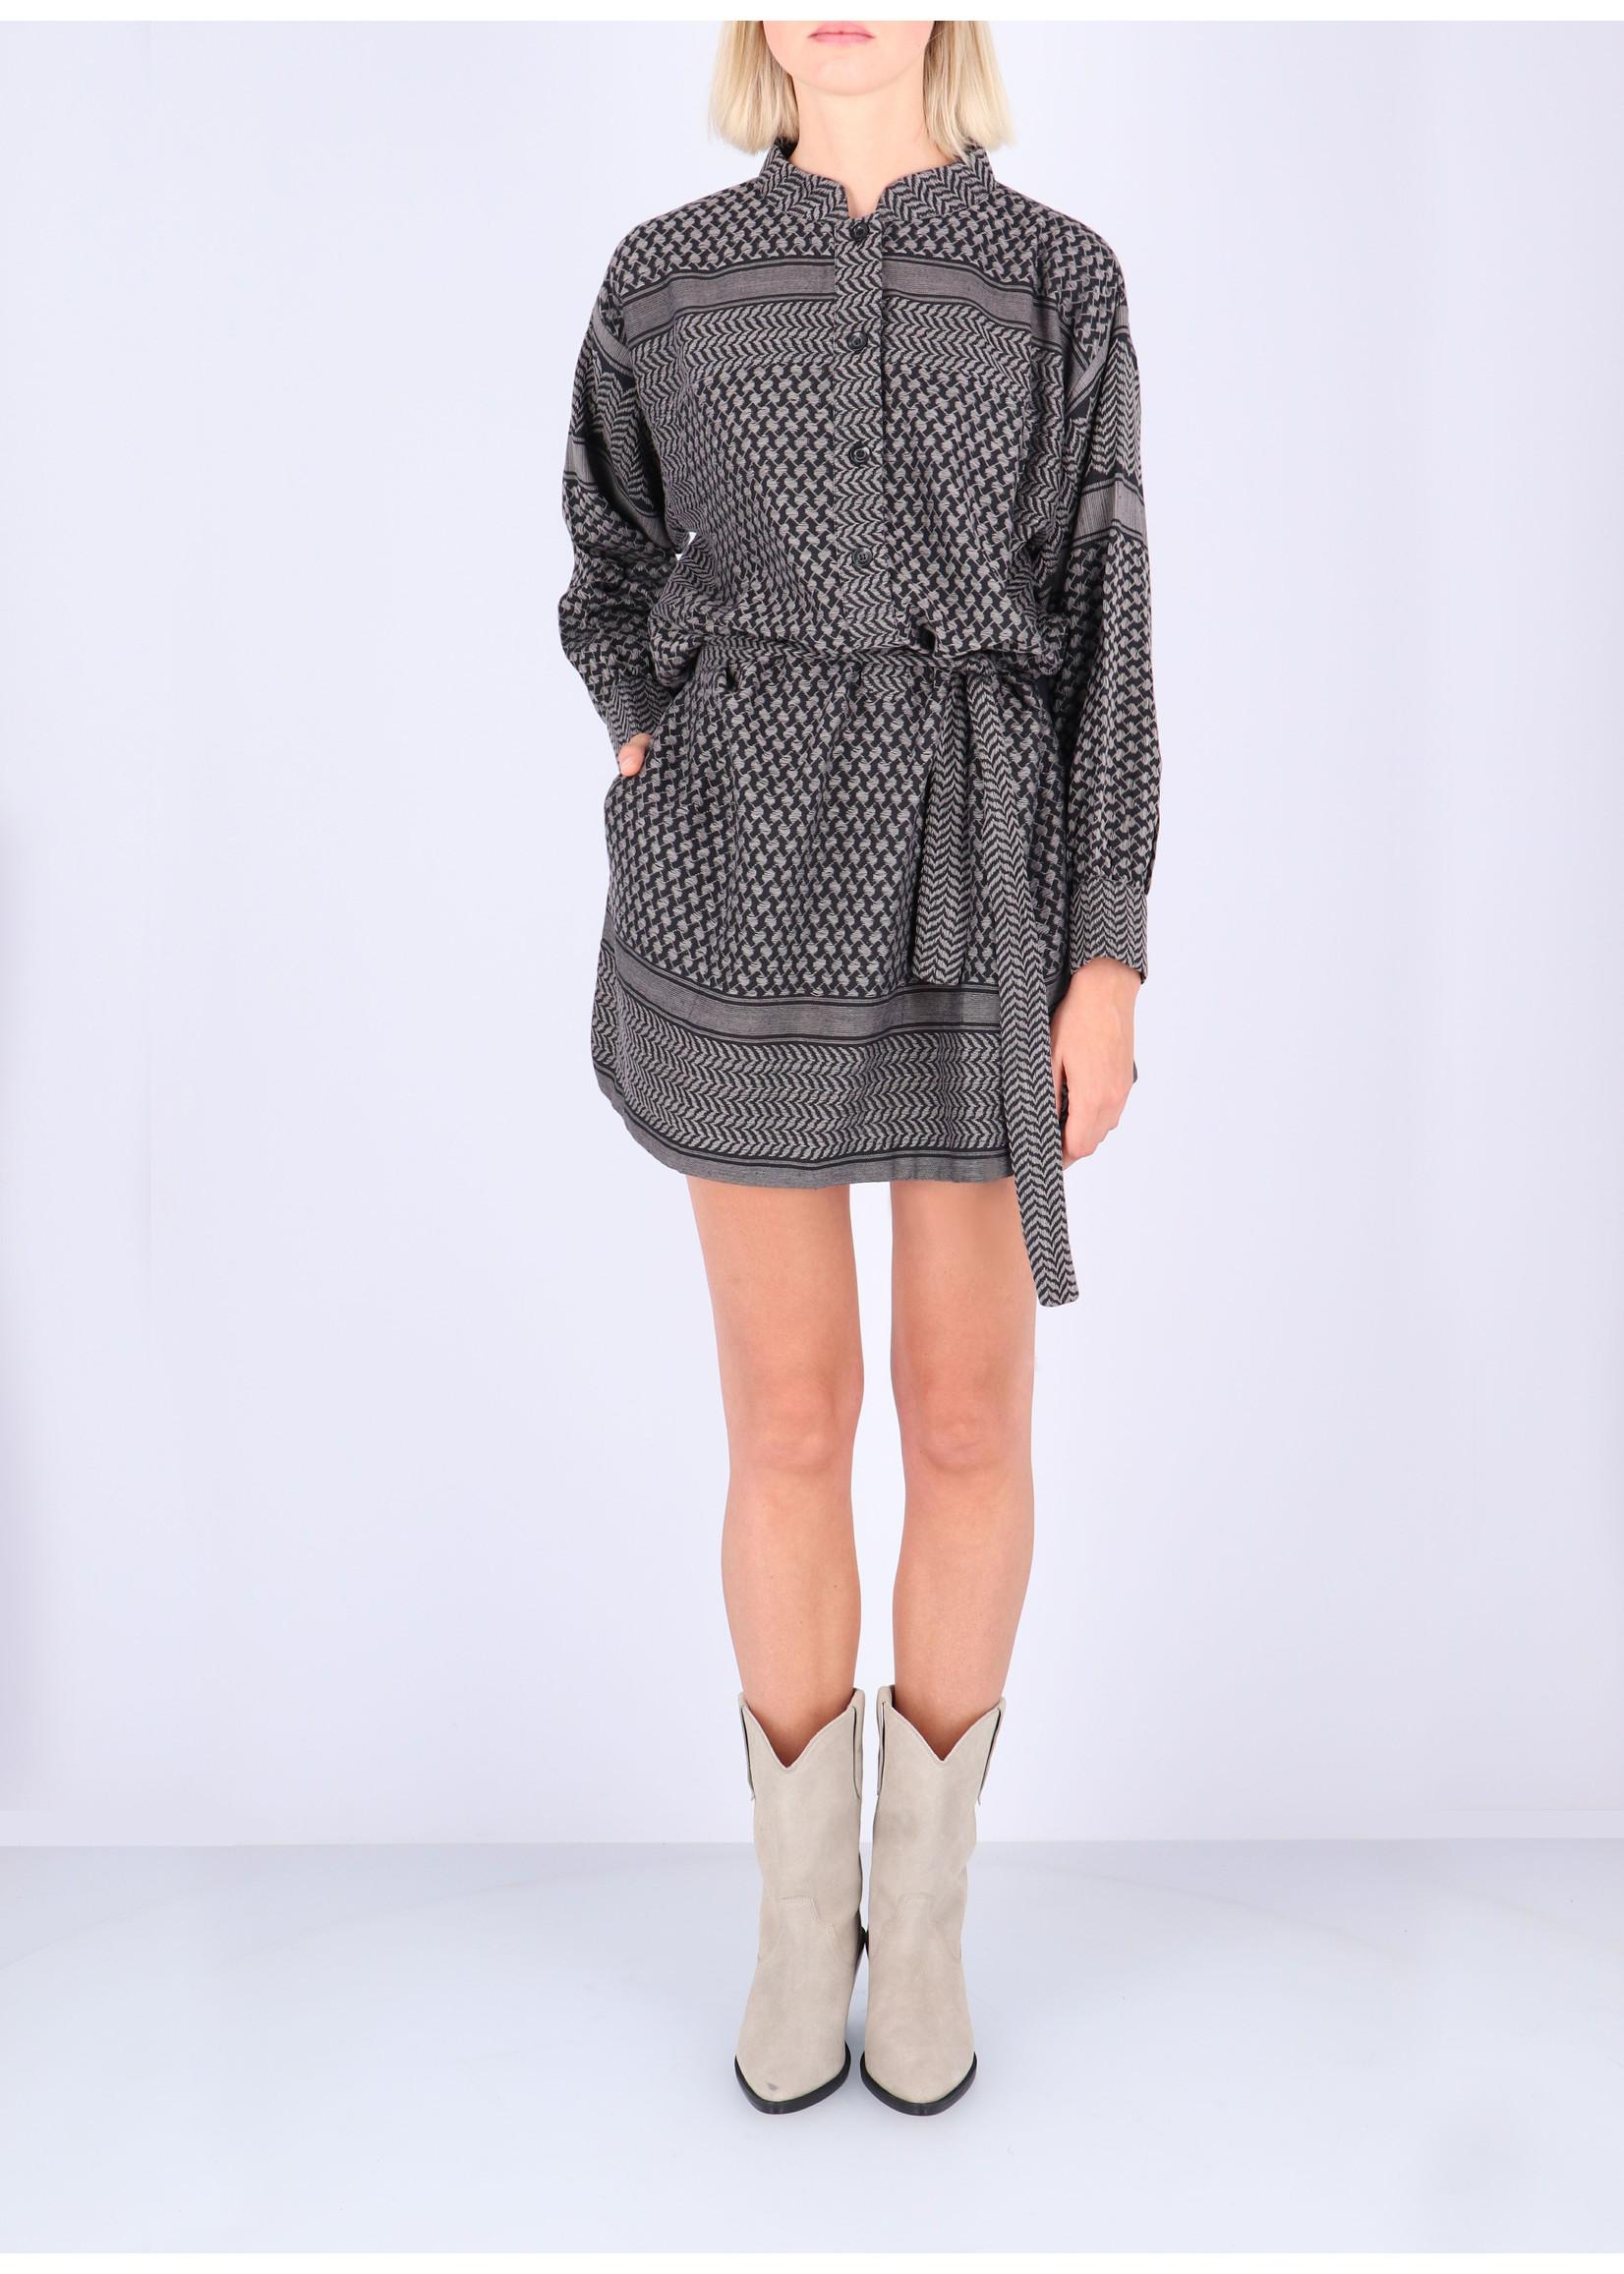 Rough Studios Leila K. Dress grey/black